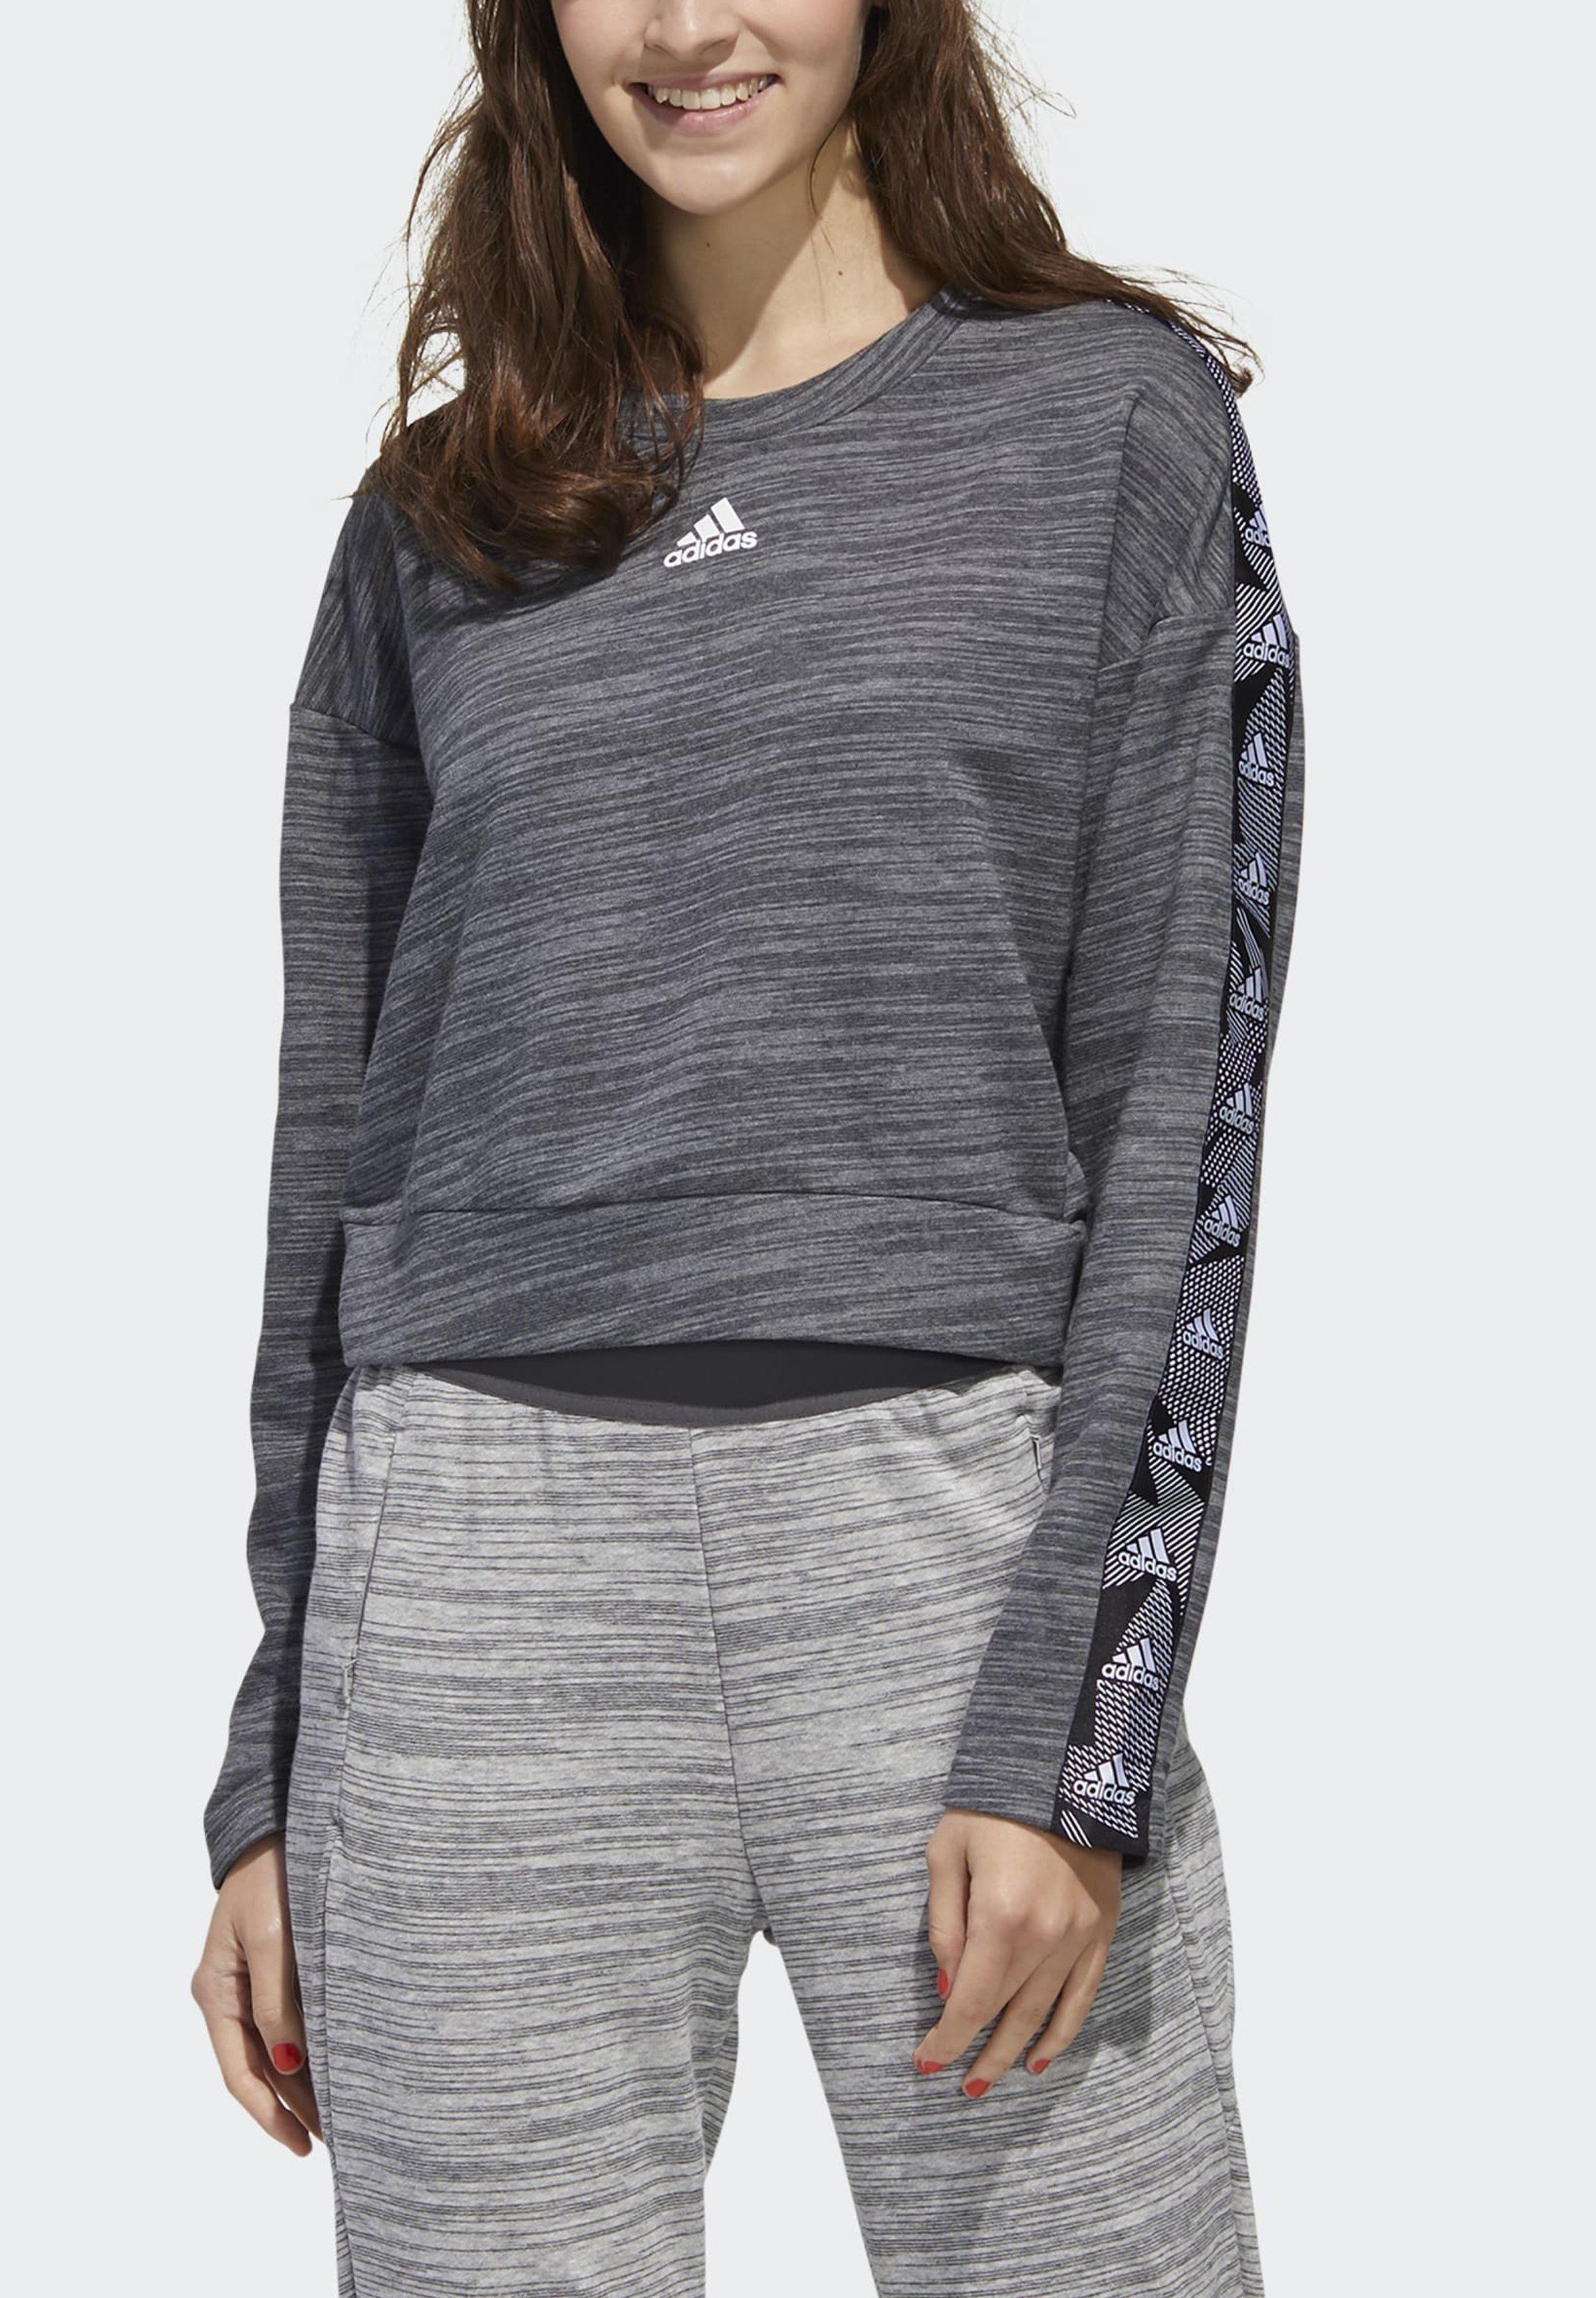 adidas Performance Sweatshirt - dark grey heather/white wVzb4